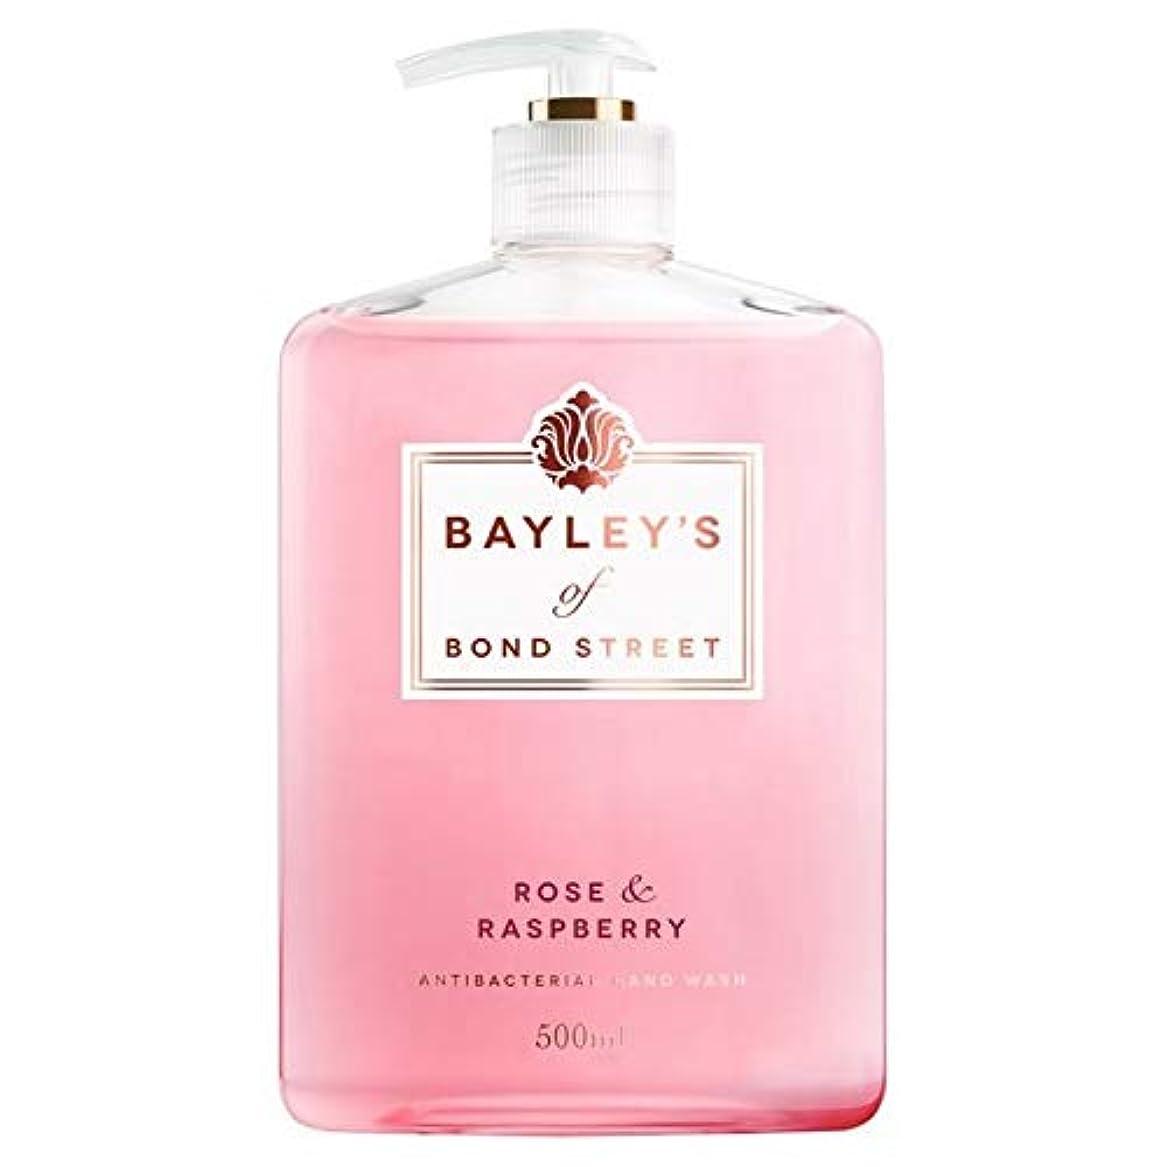 [Bayley's of Bond Street ] ベイリーのボンドストリートのは、ローズ&ラズベリーのハンドウォッシュ500ミリリットル - Bayley's of Bond Street Rose & Raspberry...